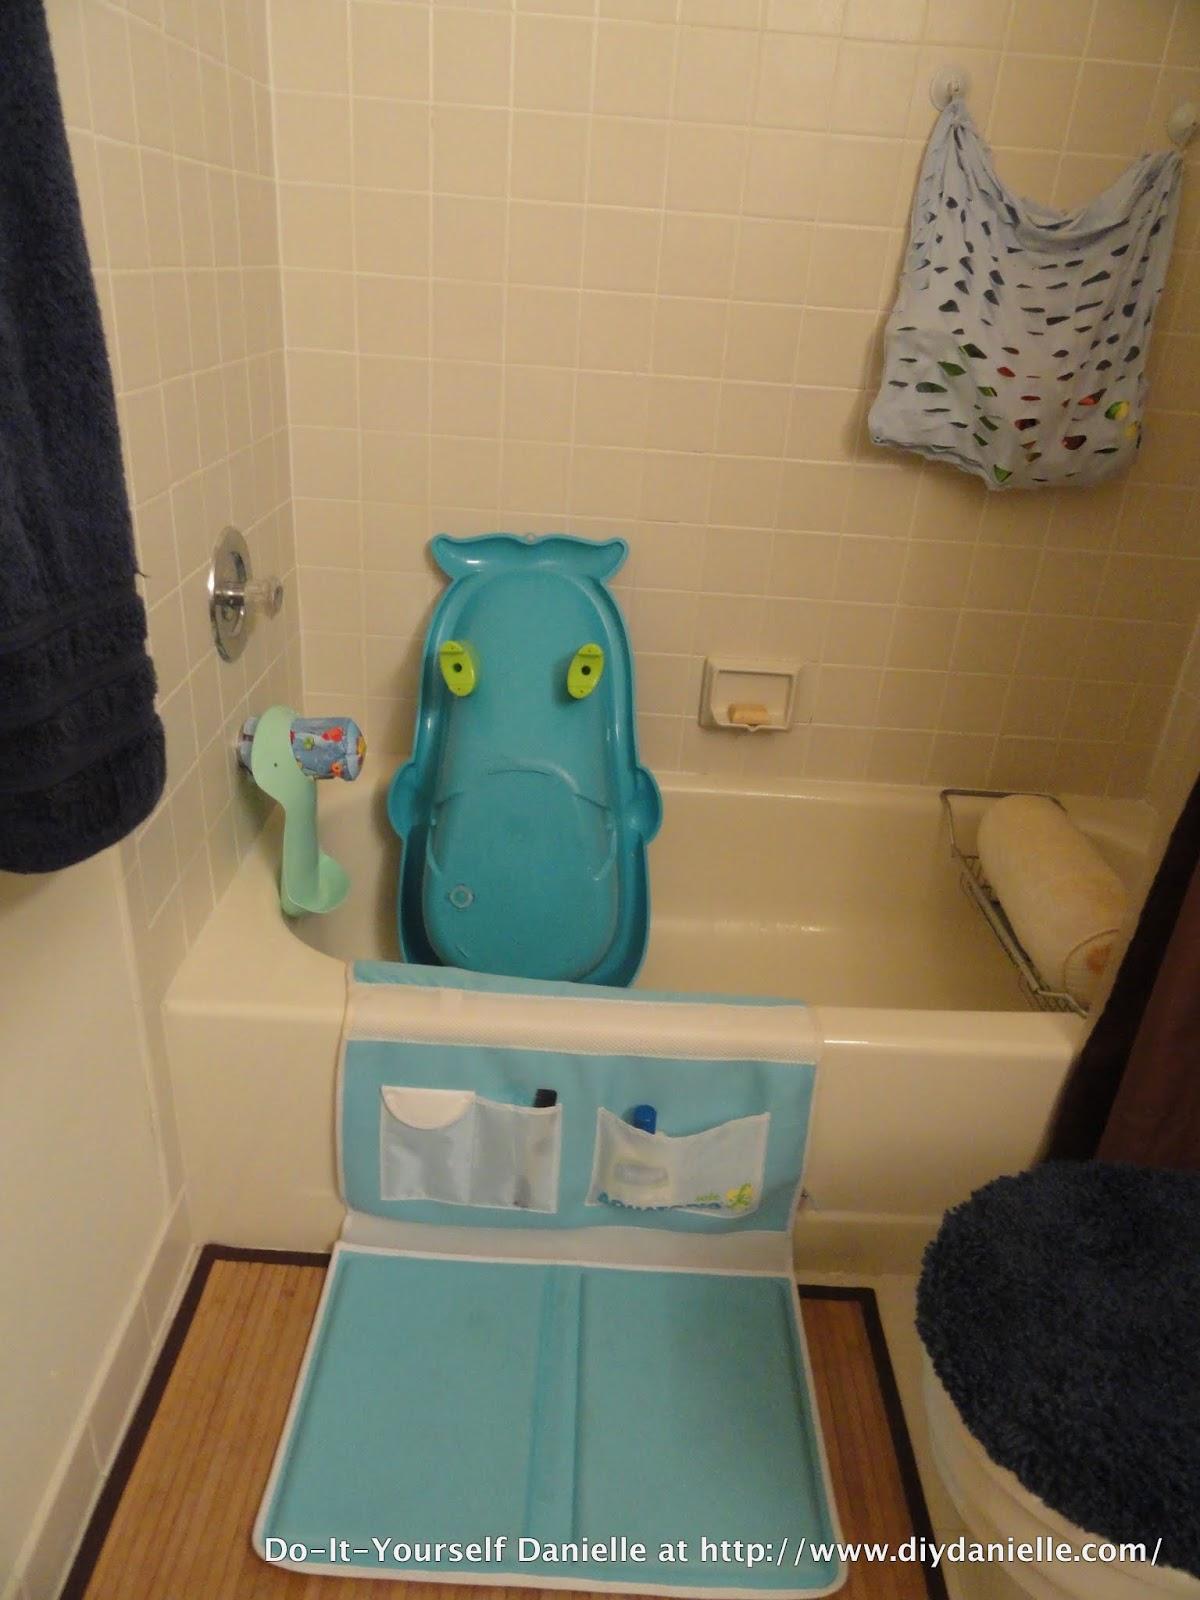 diy baby bathroom organization diy danielle. Black Bedroom Furniture Sets. Home Design Ideas